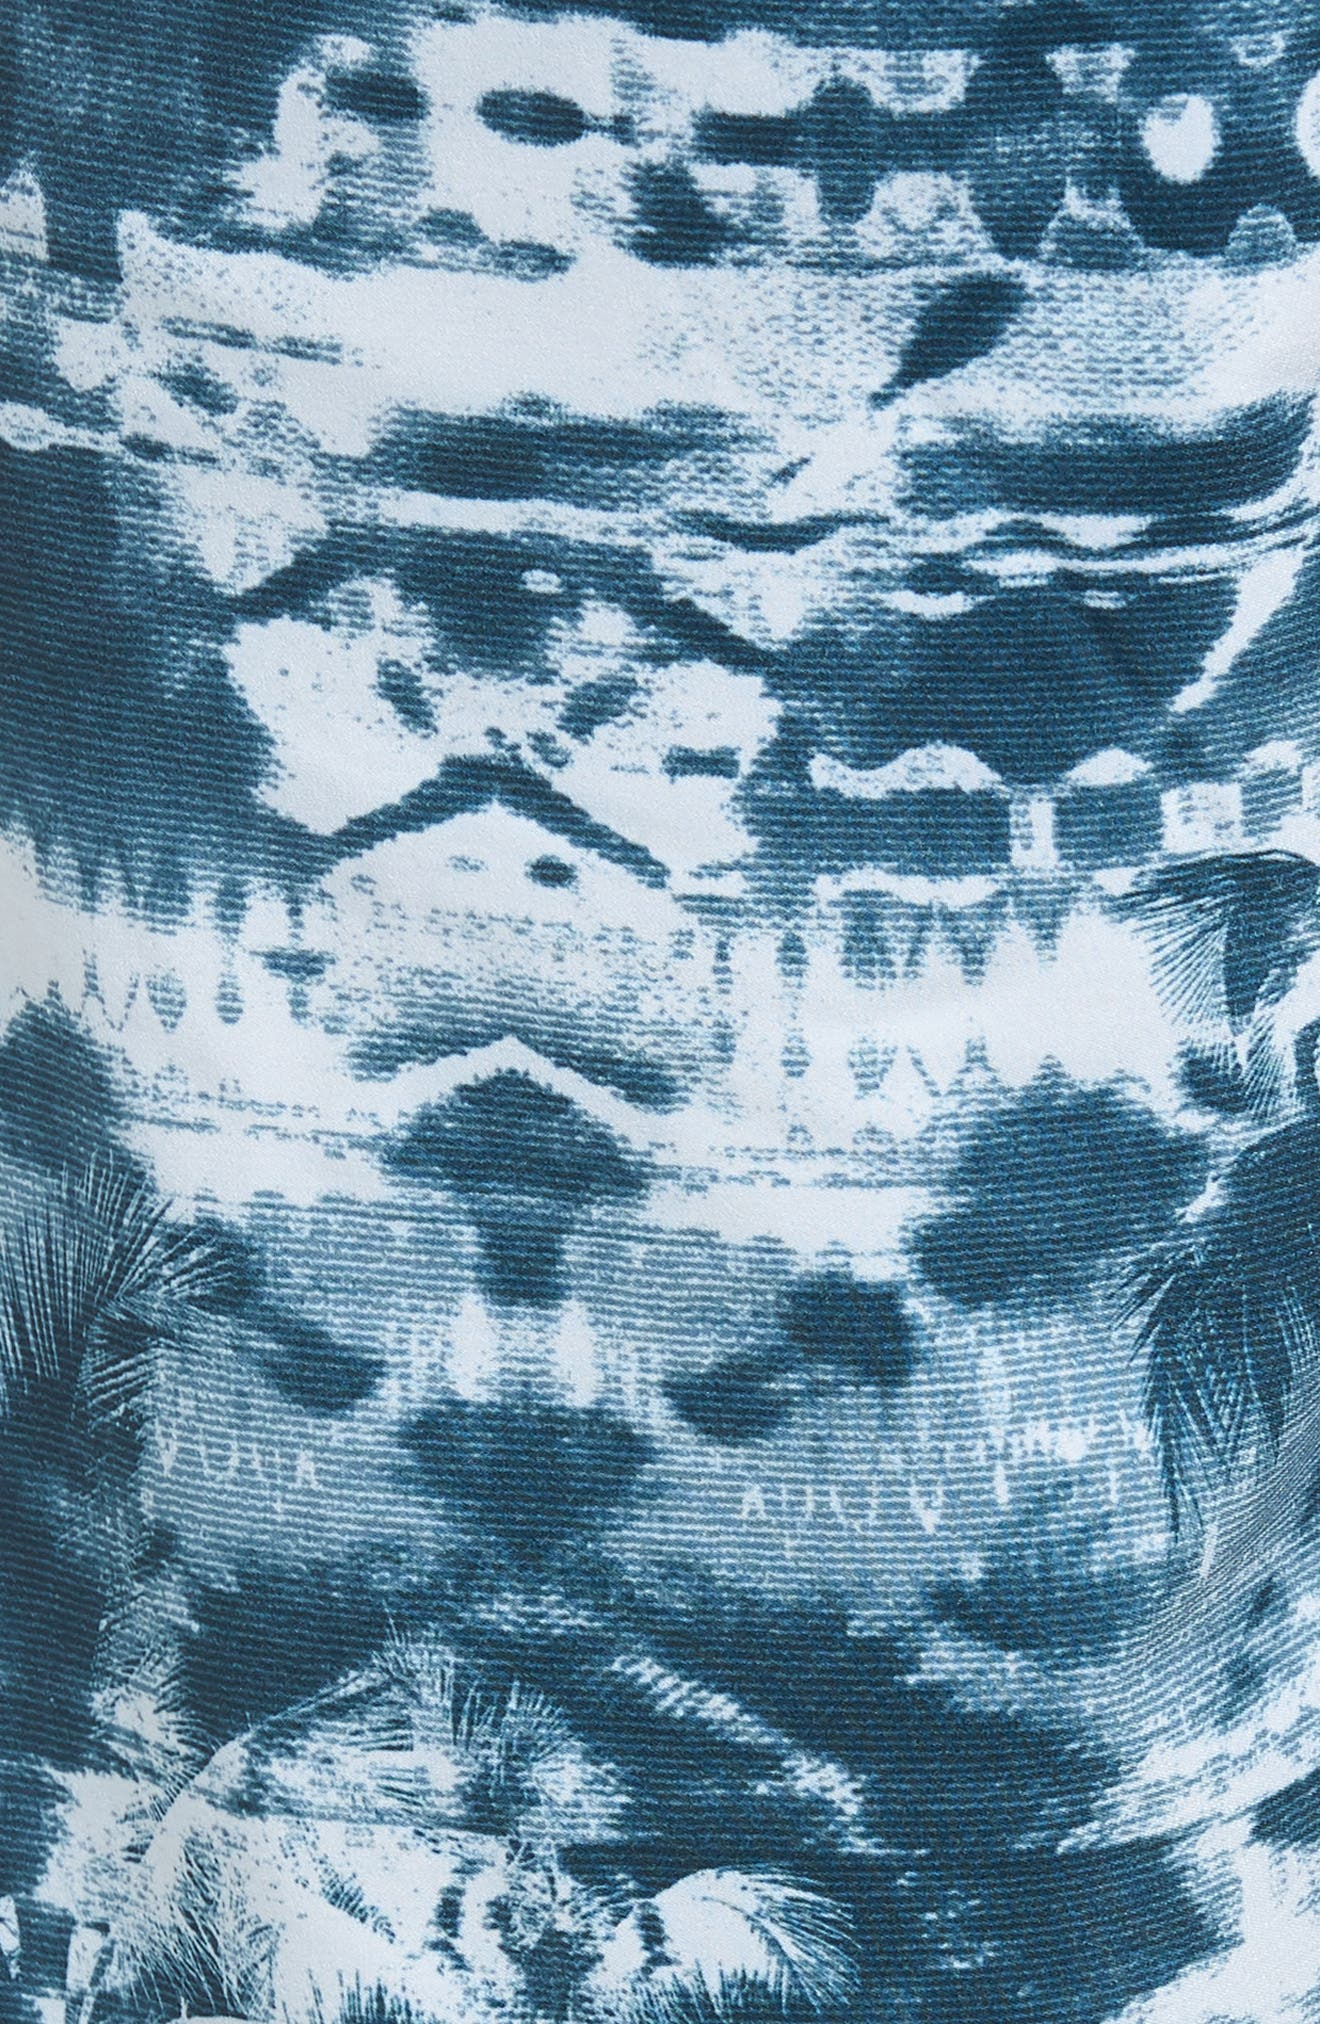 Hyperfreak Vietpalm Board Shorts,                             Alternate thumbnail 5, color,                             DARK BLUE